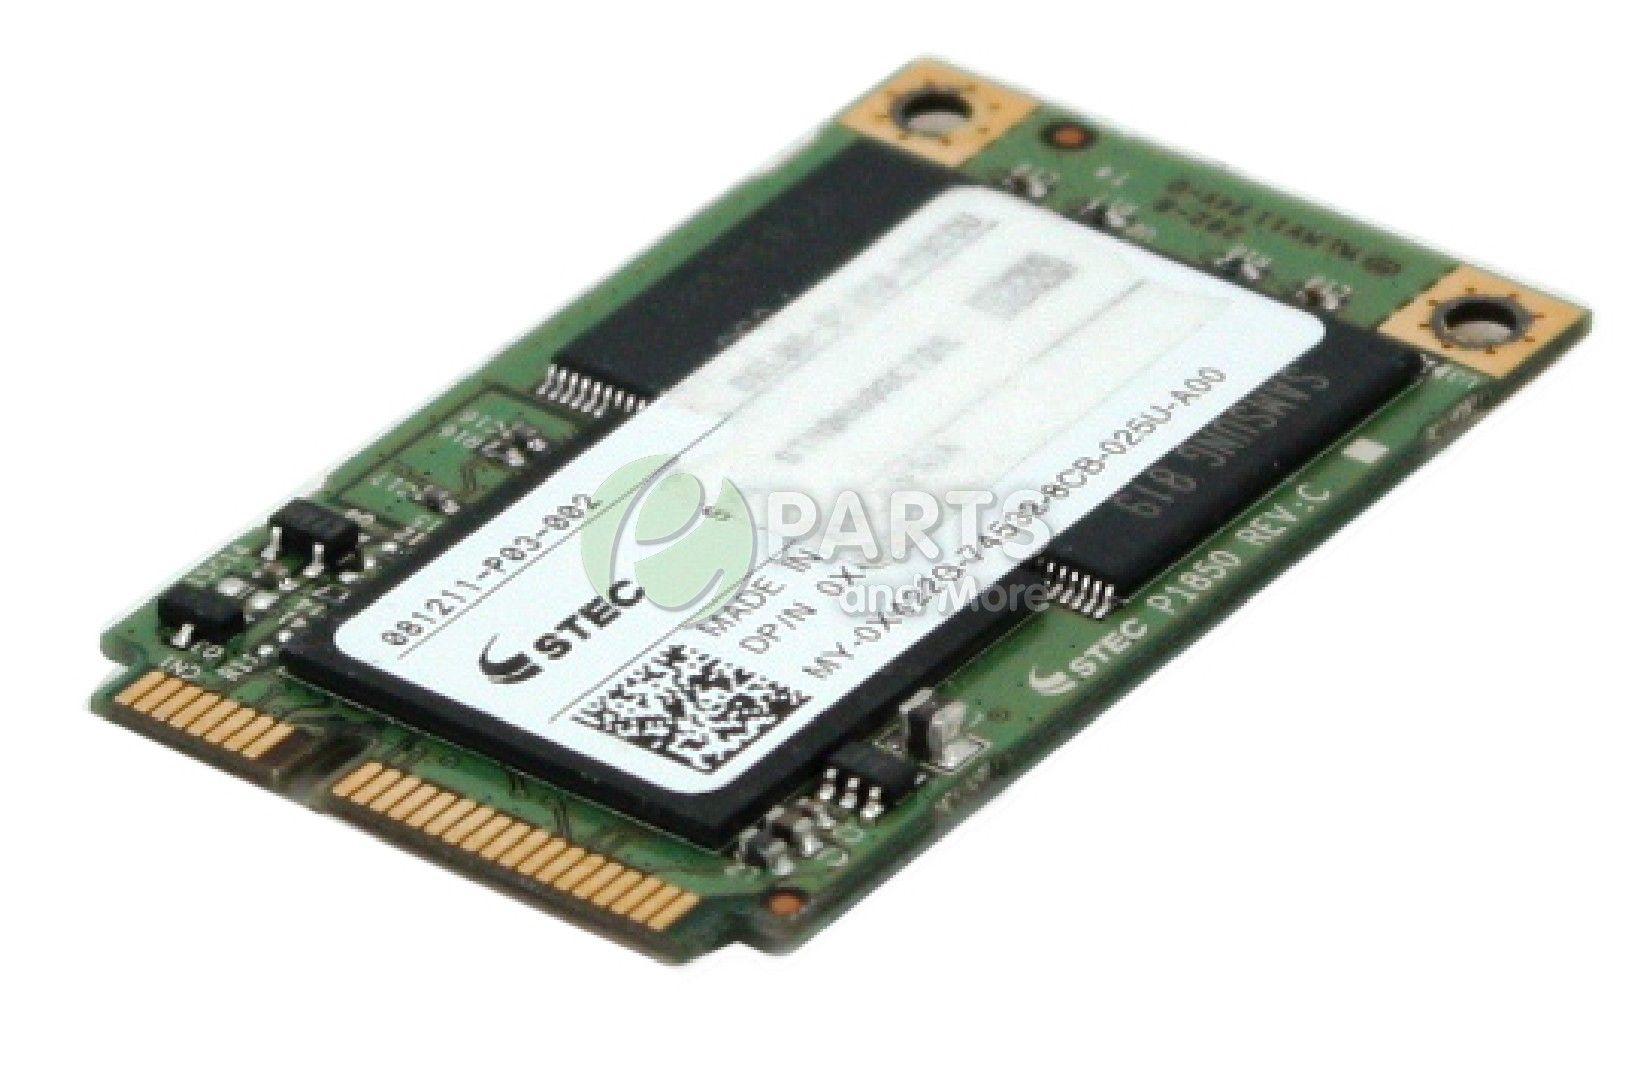 Dell Inspiron Mini 910 PCIe Laptop SSD 16GB Hard Drive X422G